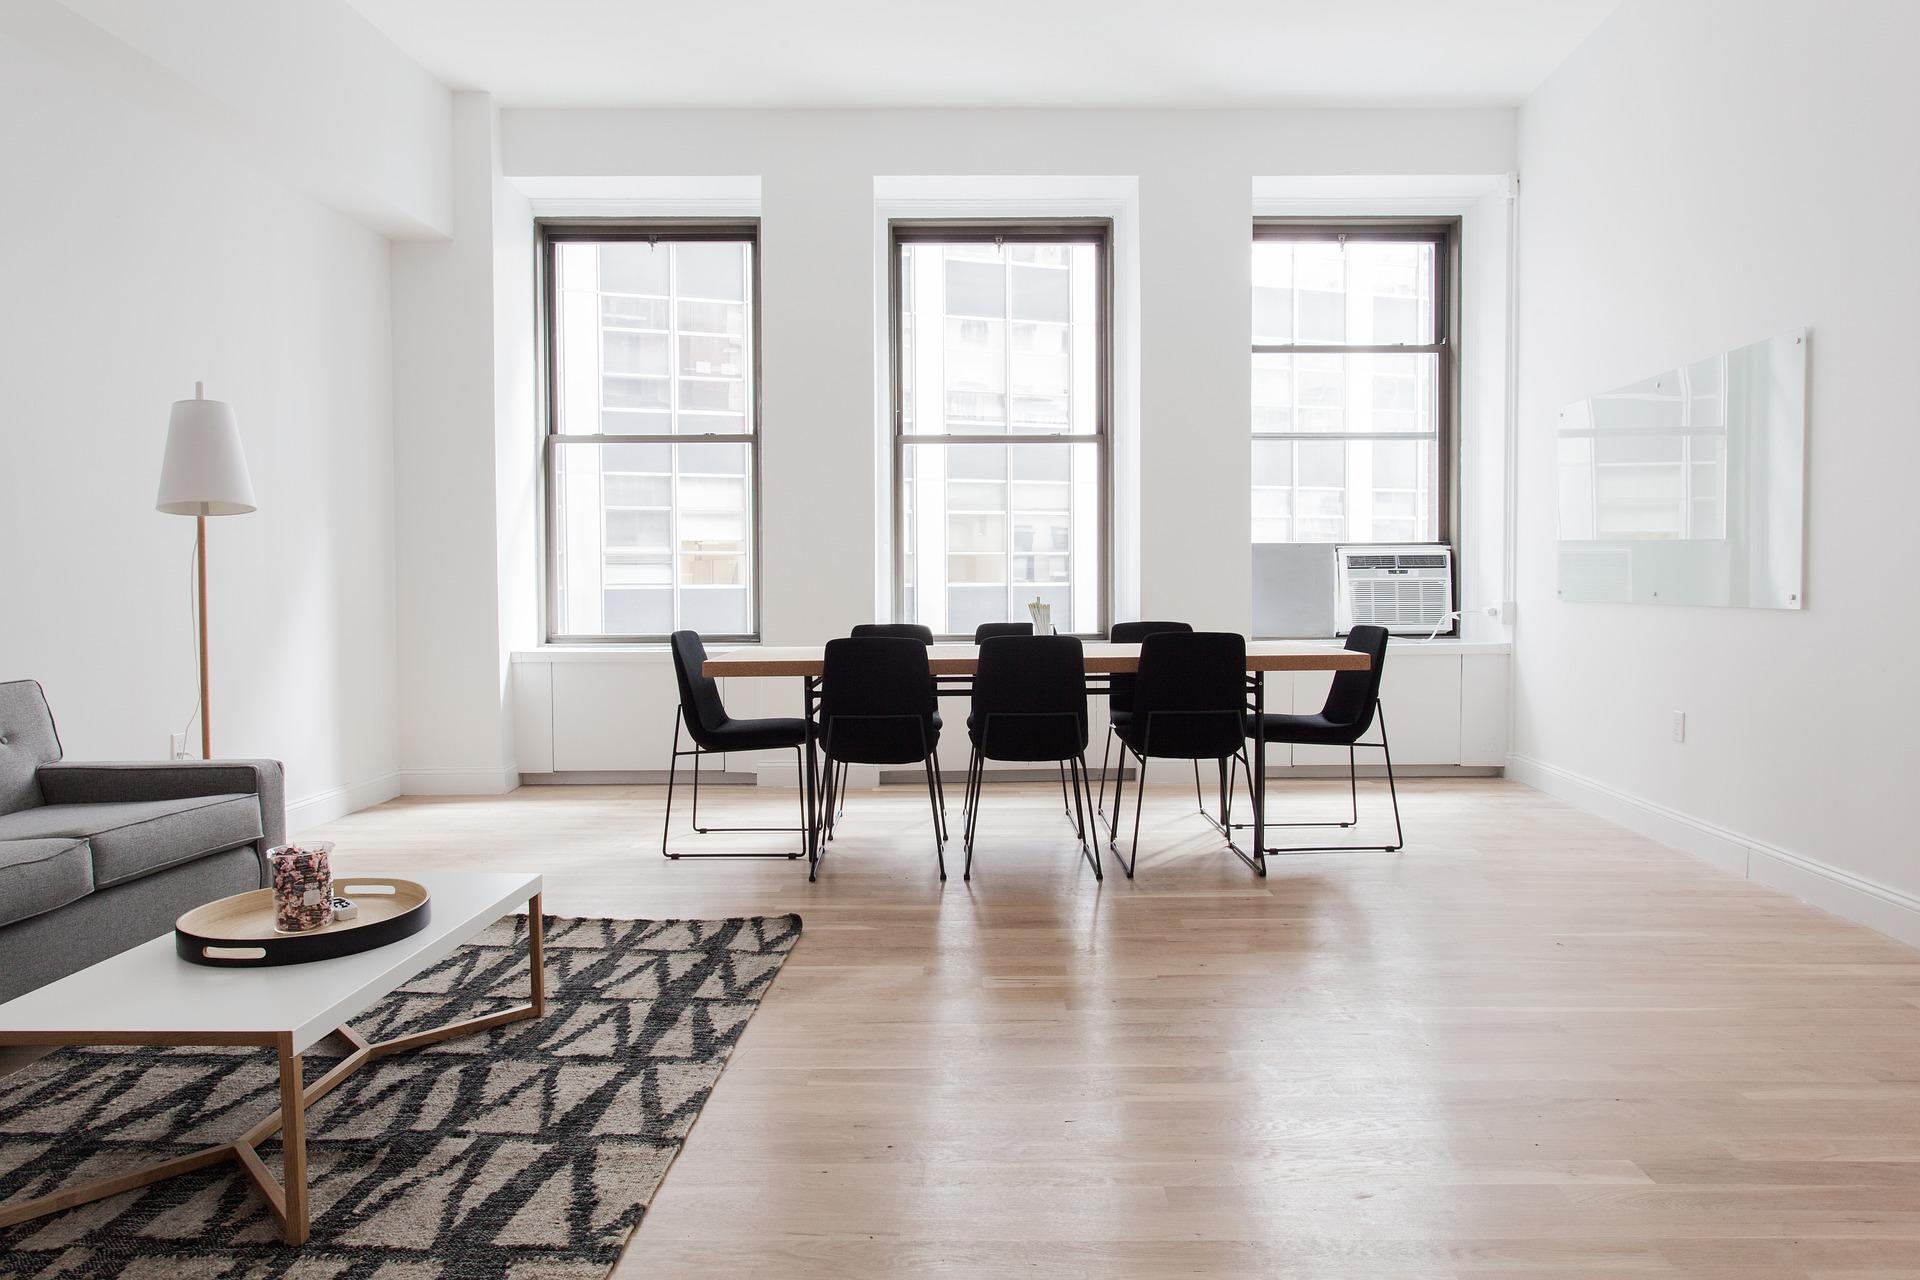 stoelen in woonkamer